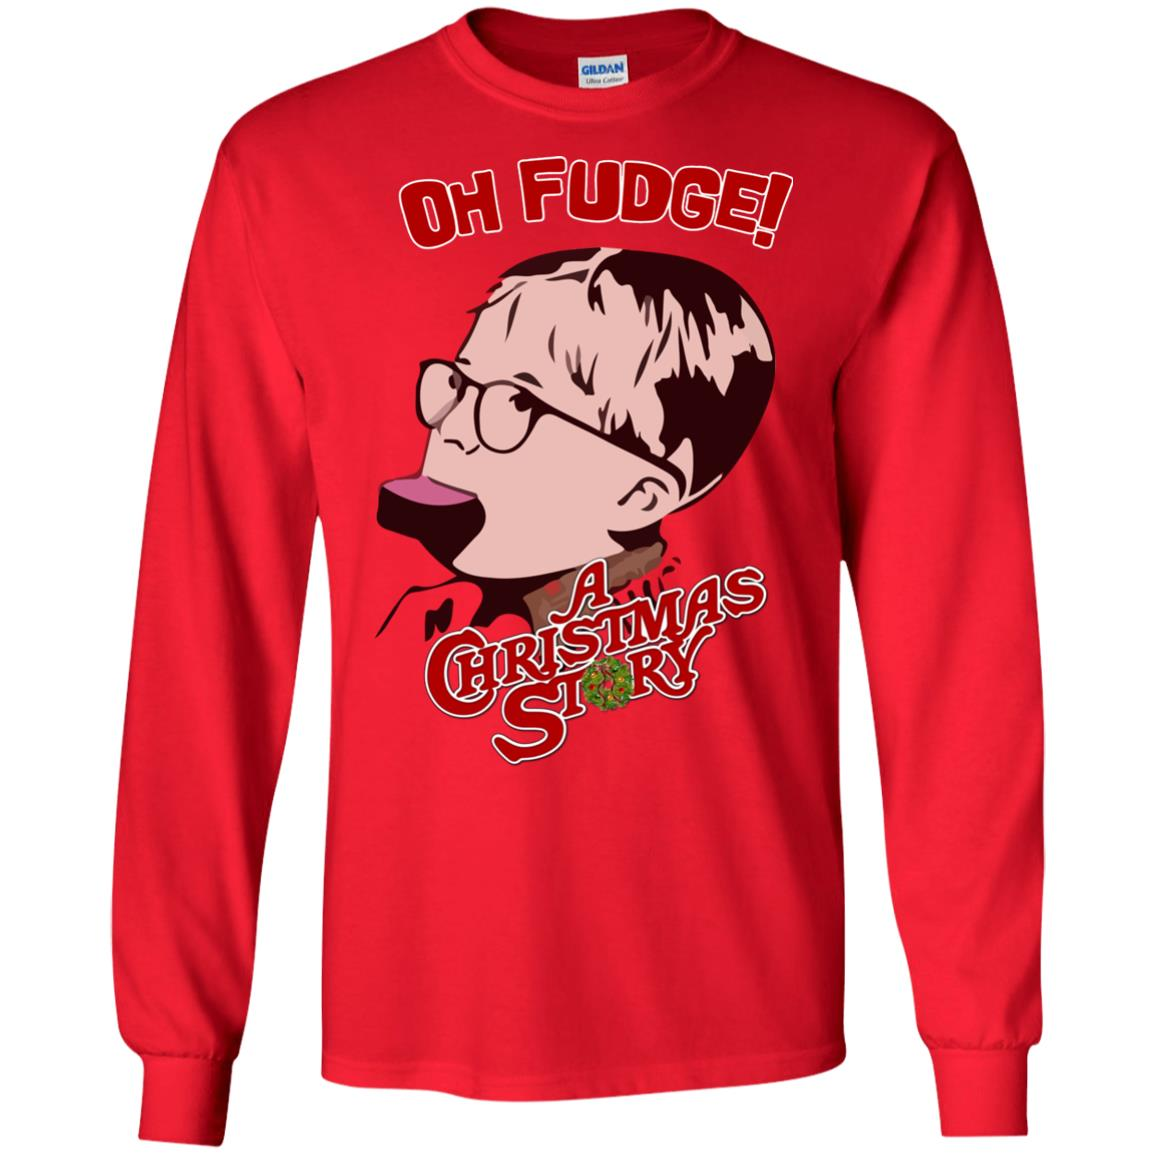 Oh Fudge A Christmas Story Sweater, Hoodie, Long Sleeve - Rockatee